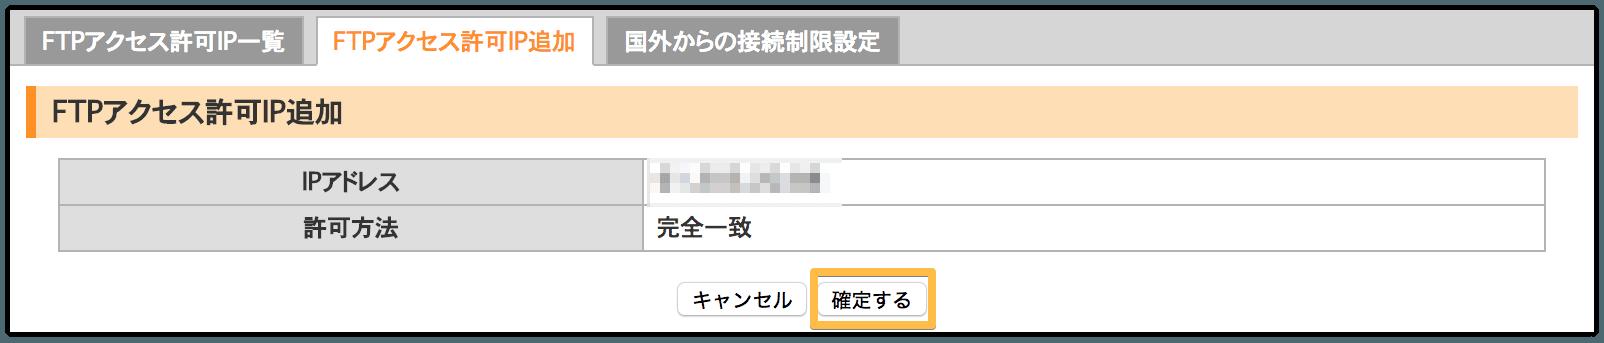 FTPアクセス許可IP追加3